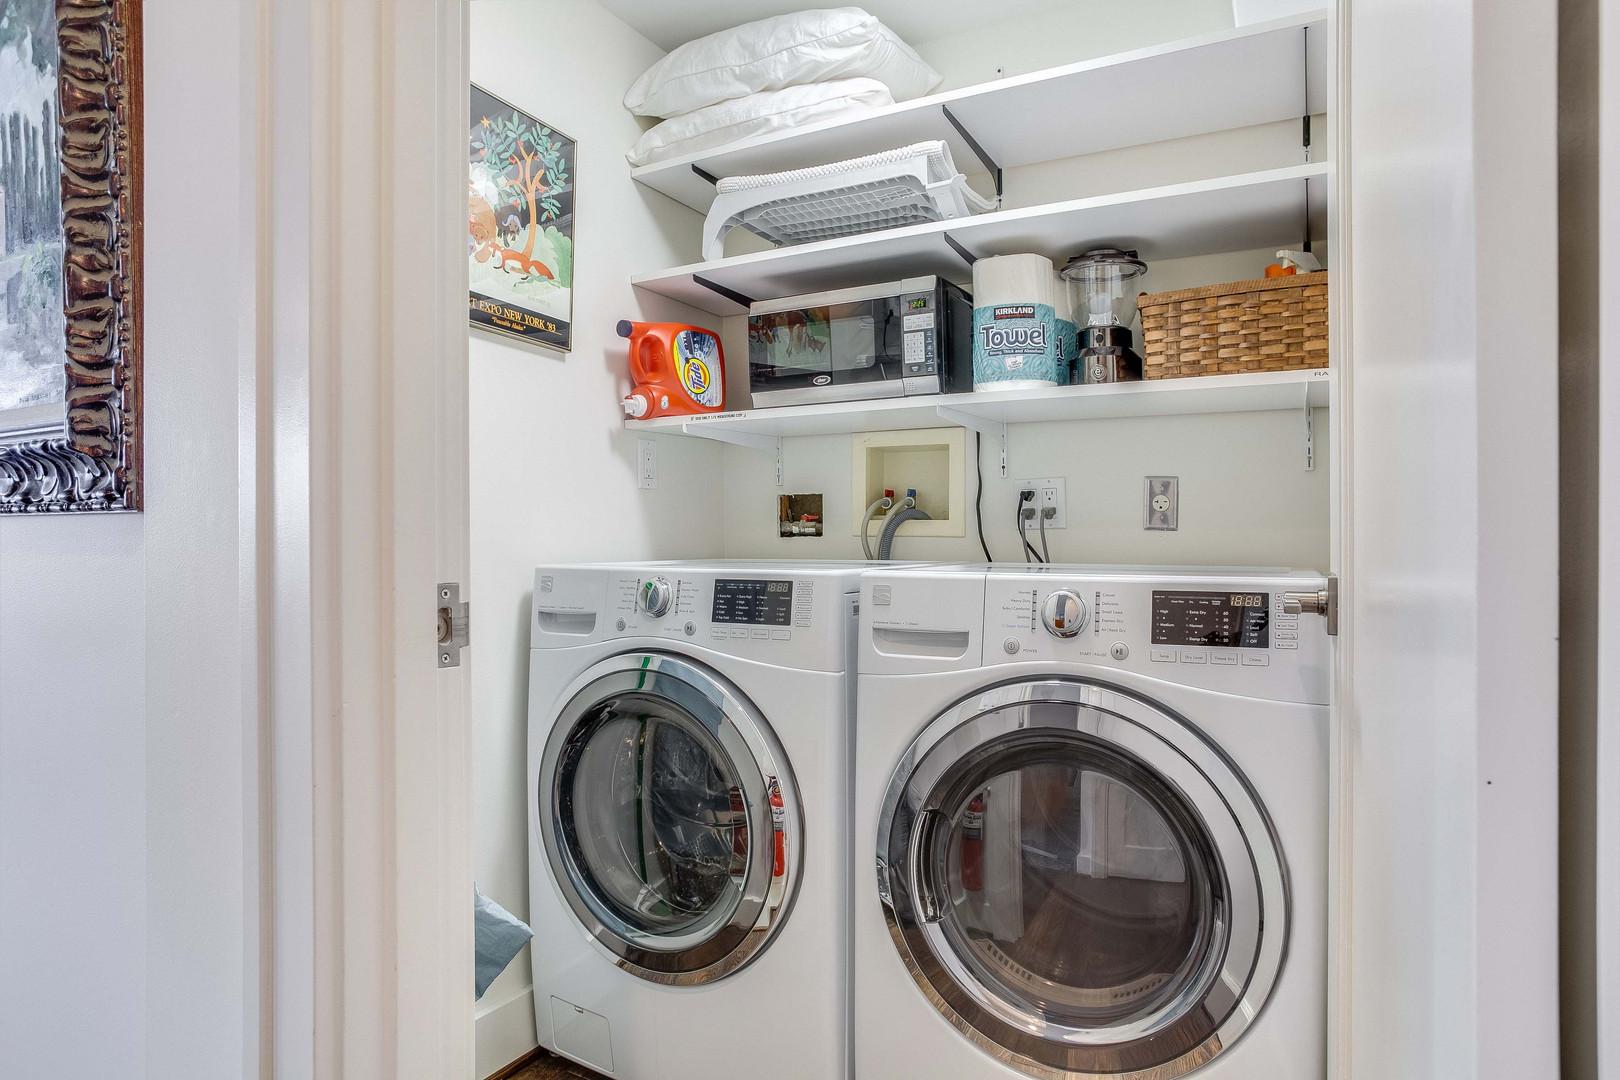 Full Sized Washer & Dryer